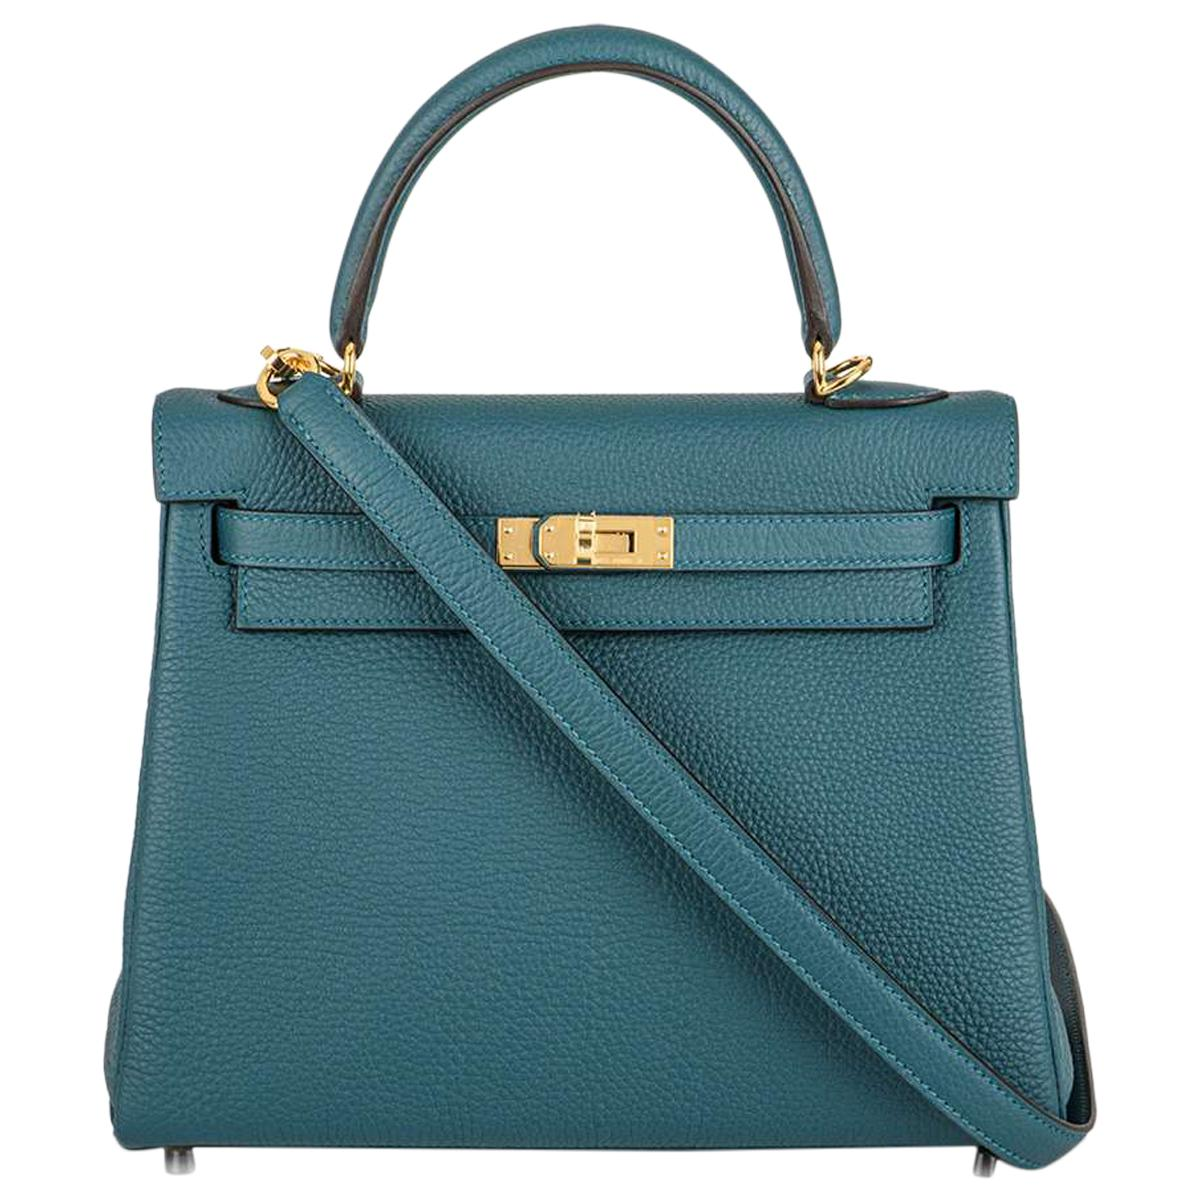 Hermès Kelly II Retourne 25cm Vert Bosphore Togo Handbag